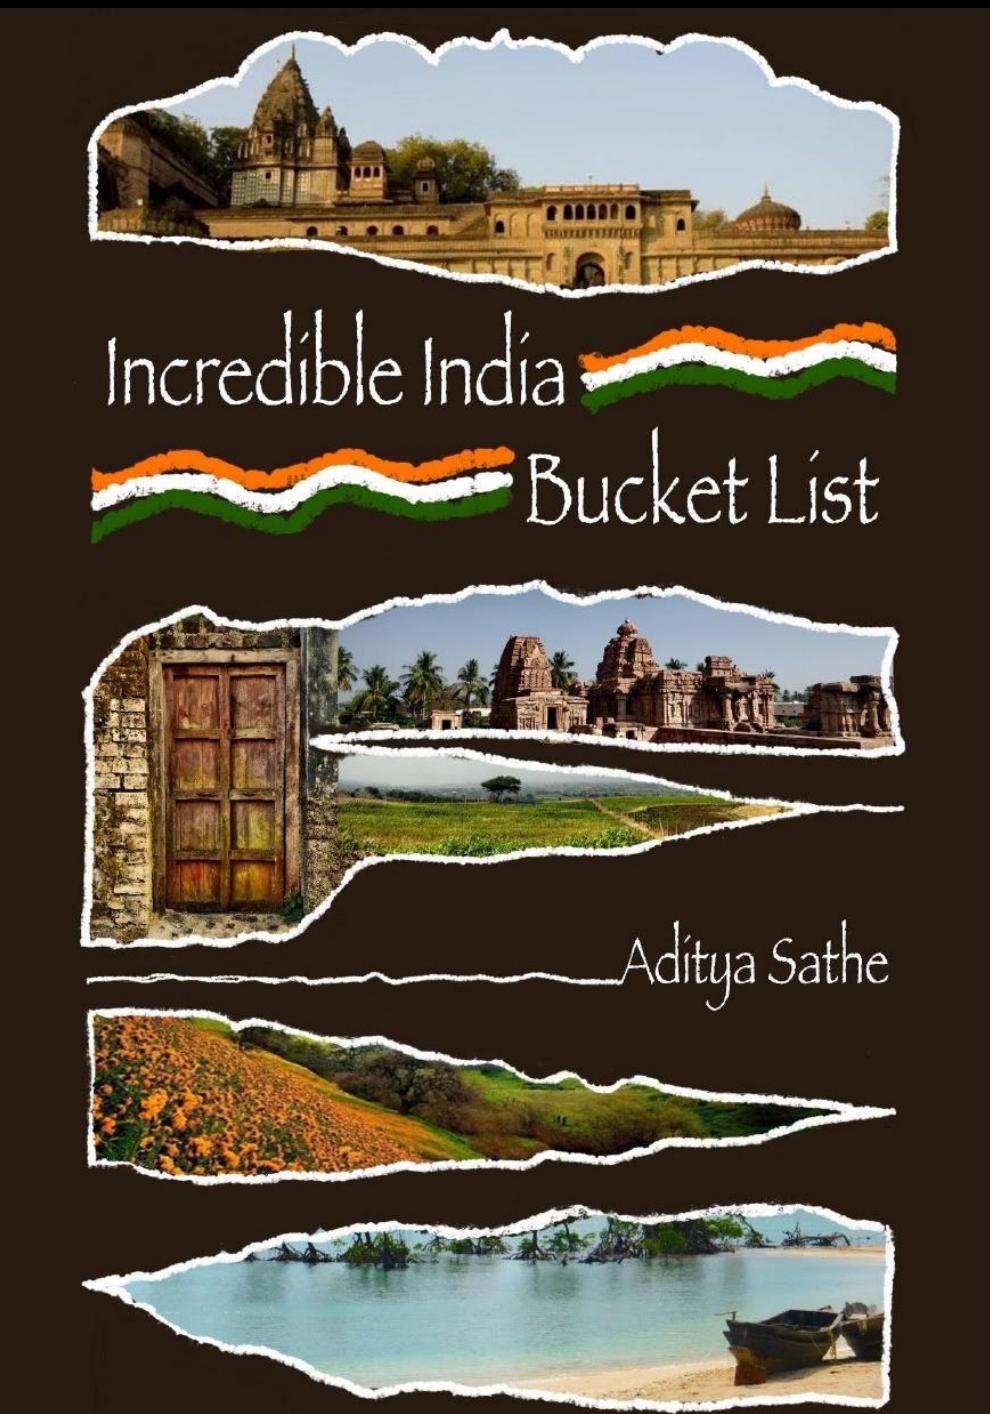 Incredible India Bucket List by Aditya Sathe #bookchatter #bookreview #books @AdisJournal